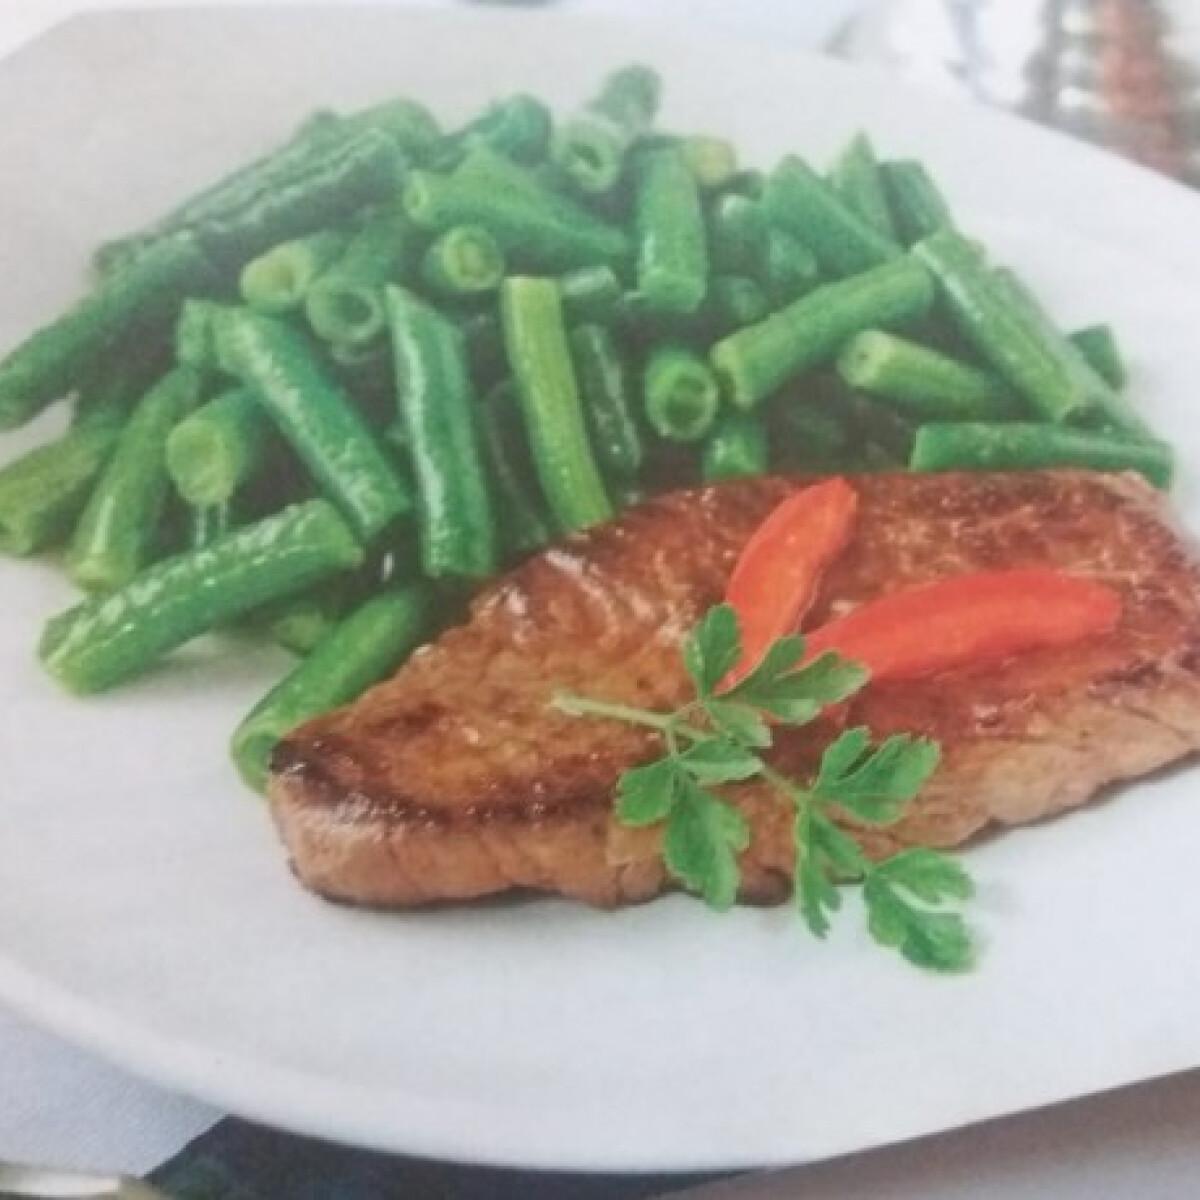 Svájci paradicsomos steak, zöldbabbal